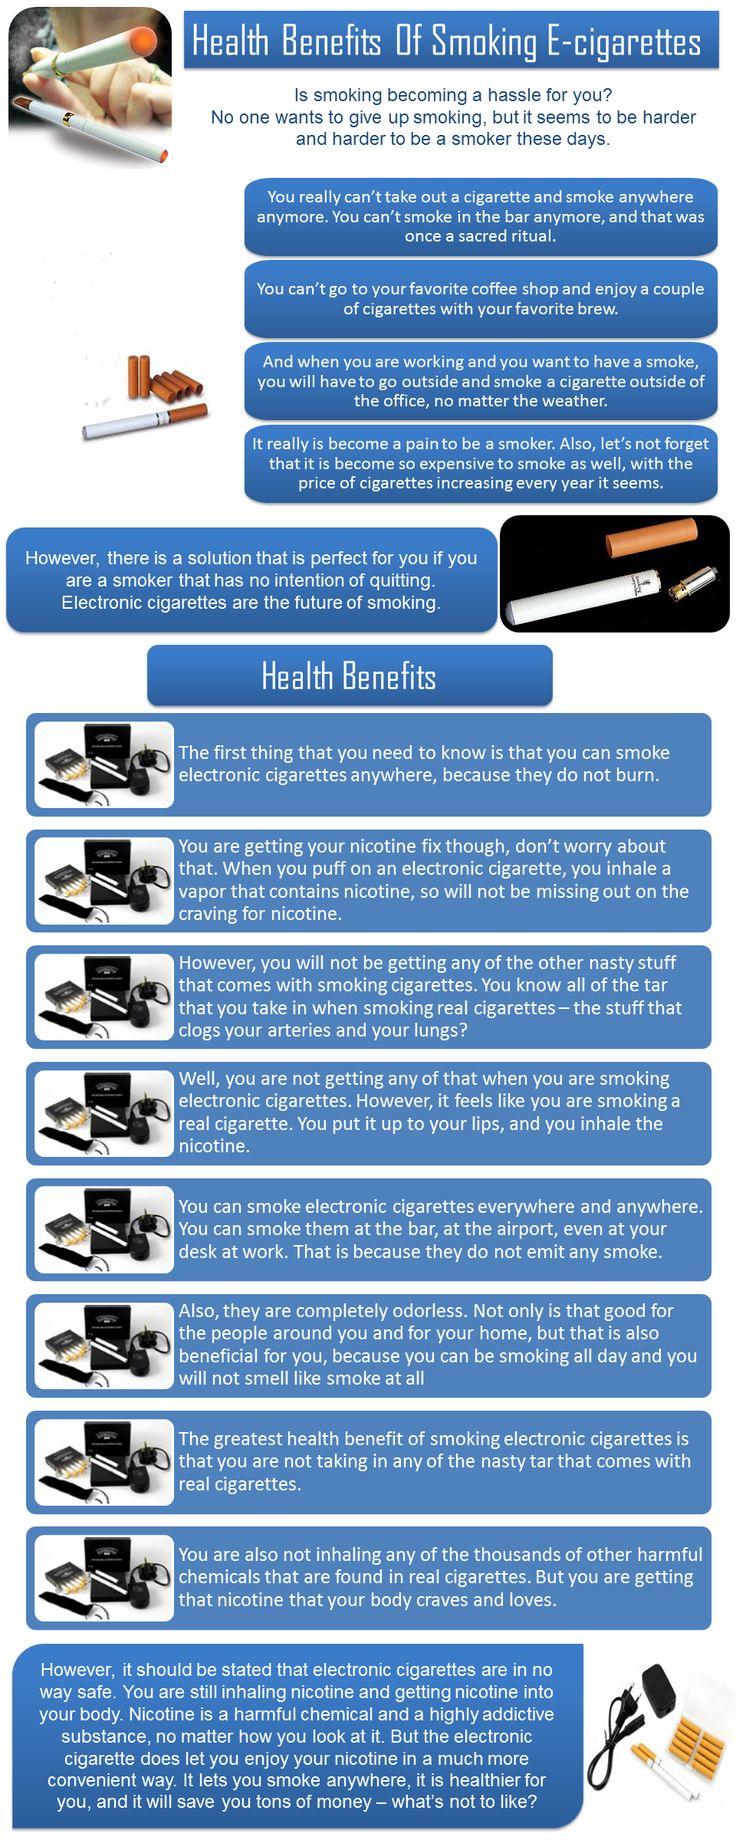 health-benefits-of-smoking-e-cigarettes-infographic